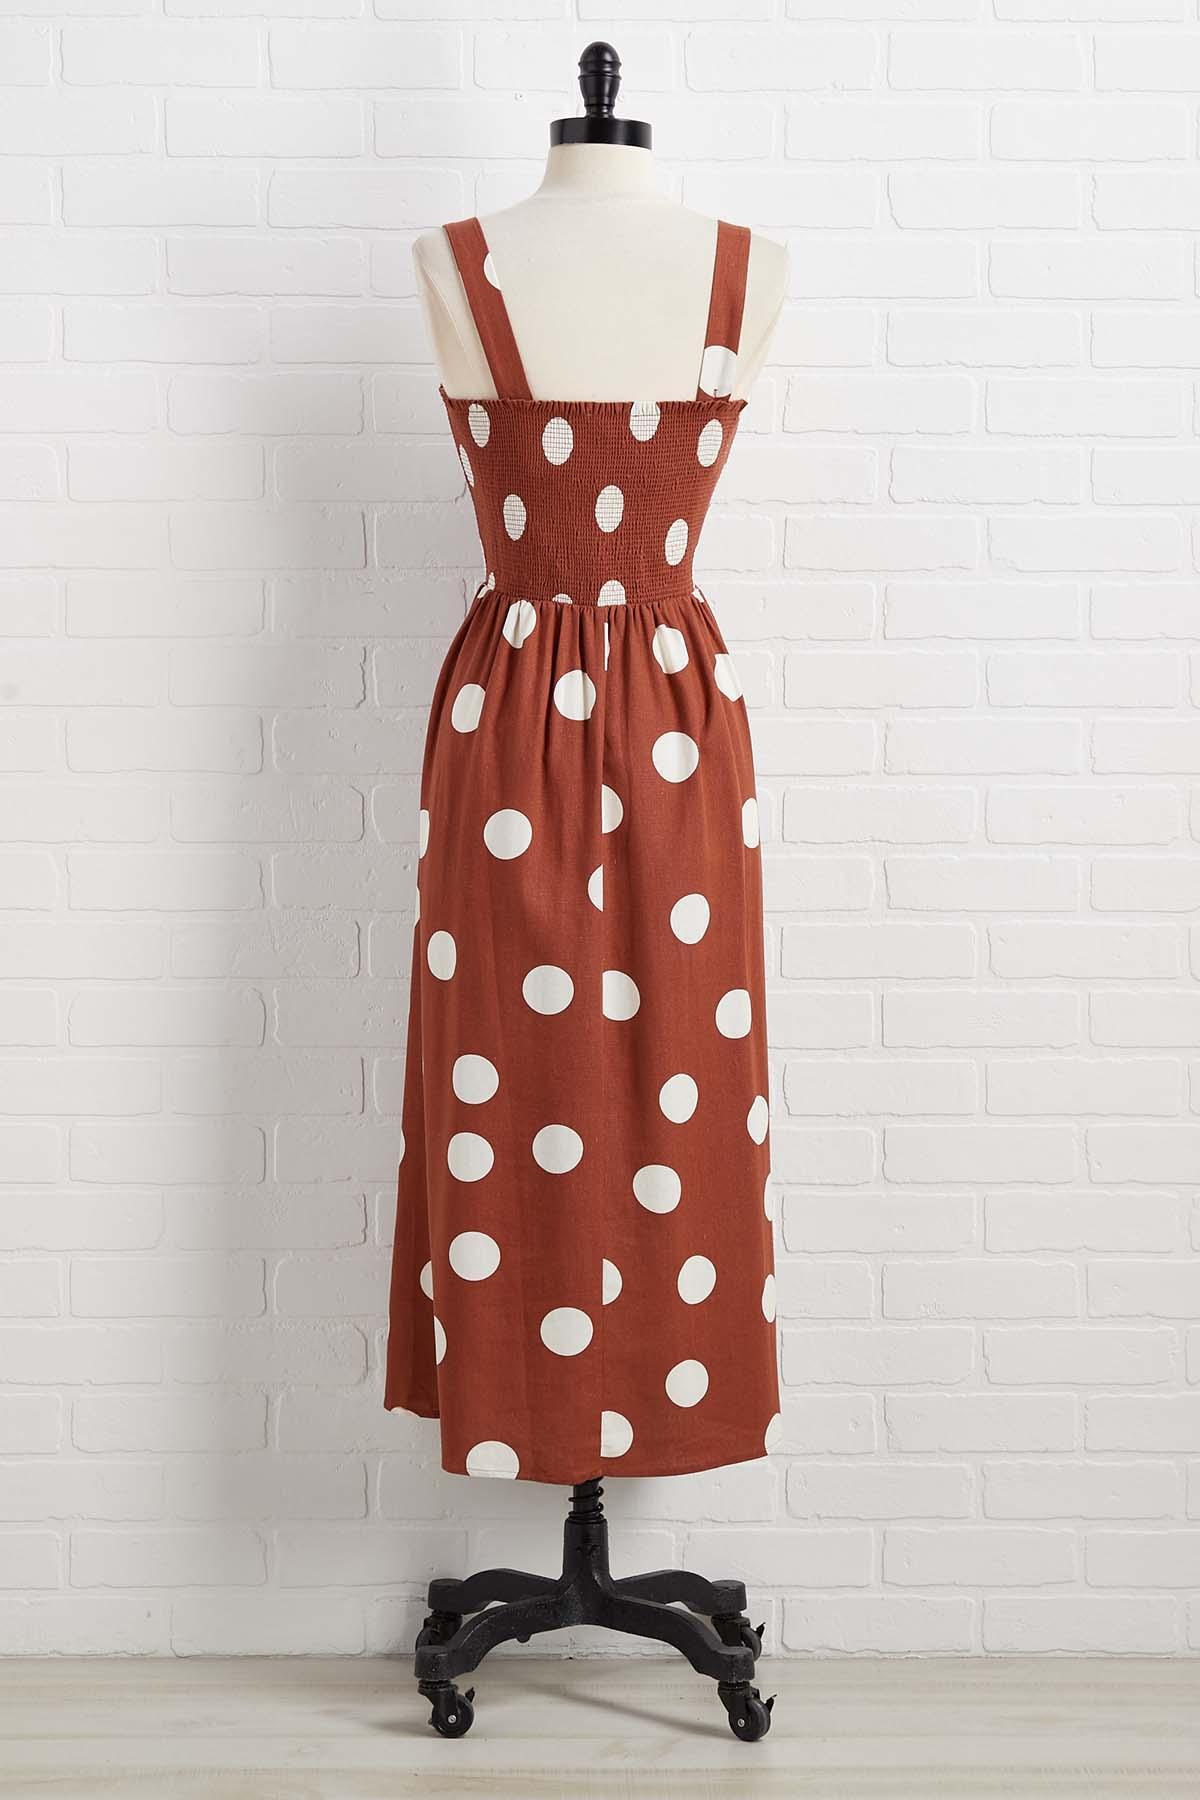 Give It A Second Dot Dress